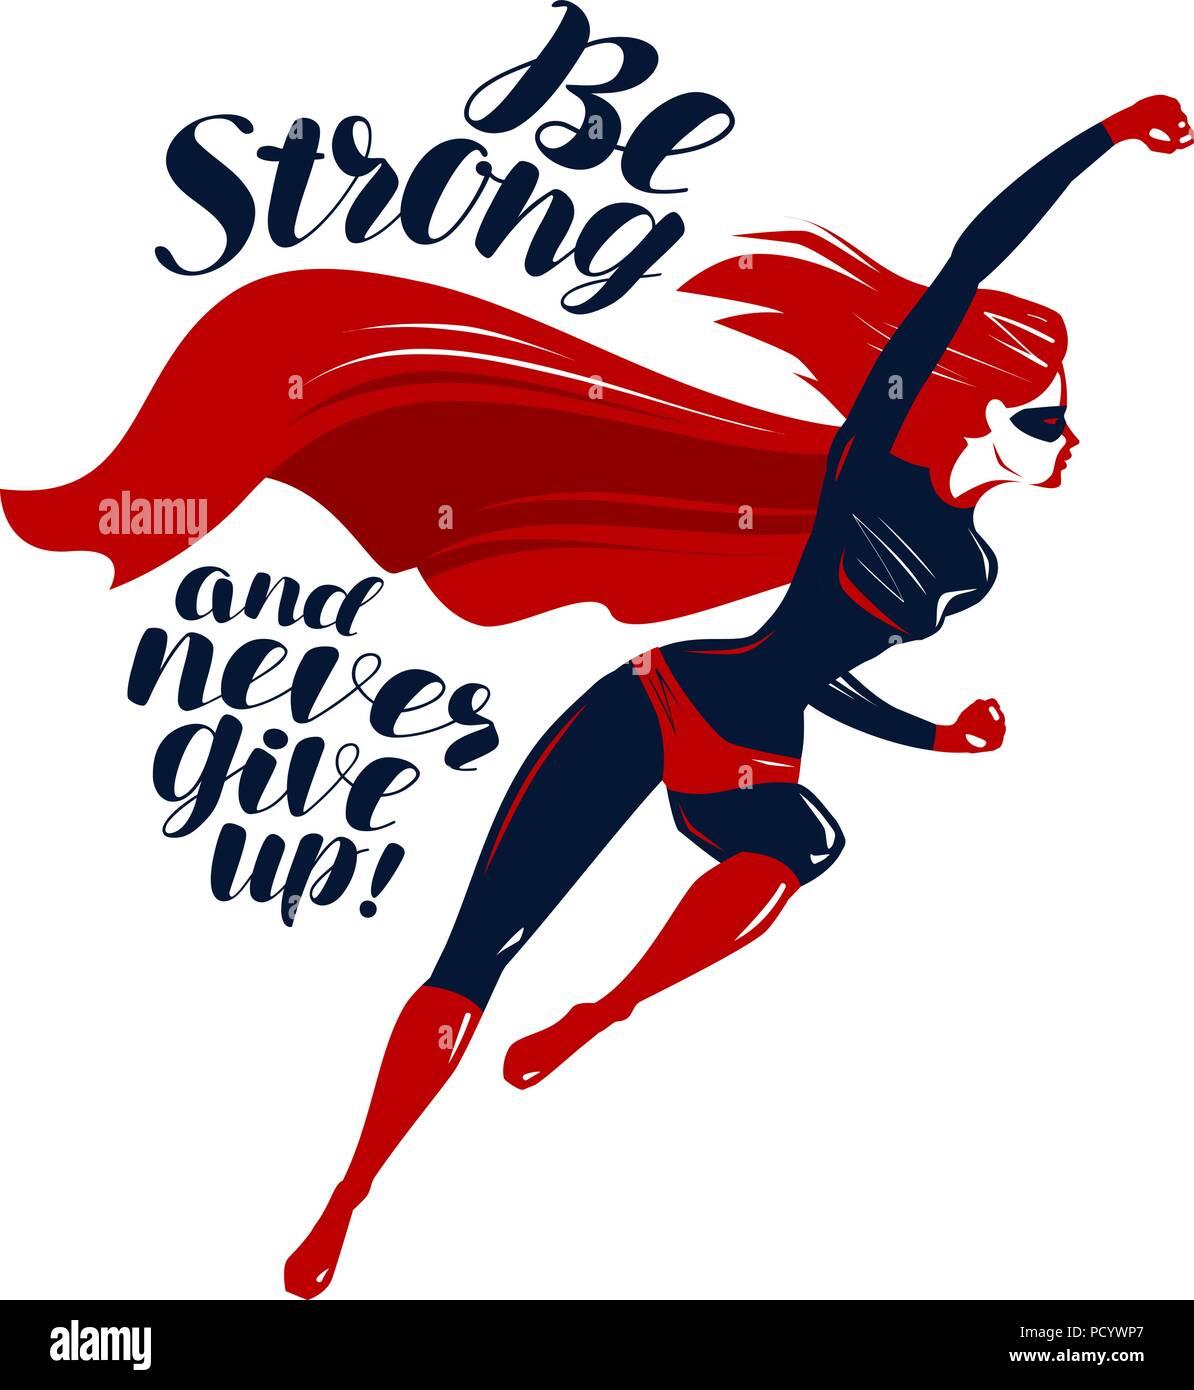 Superhero in flight. Typographic design, lettering vector illustration - Stock Image